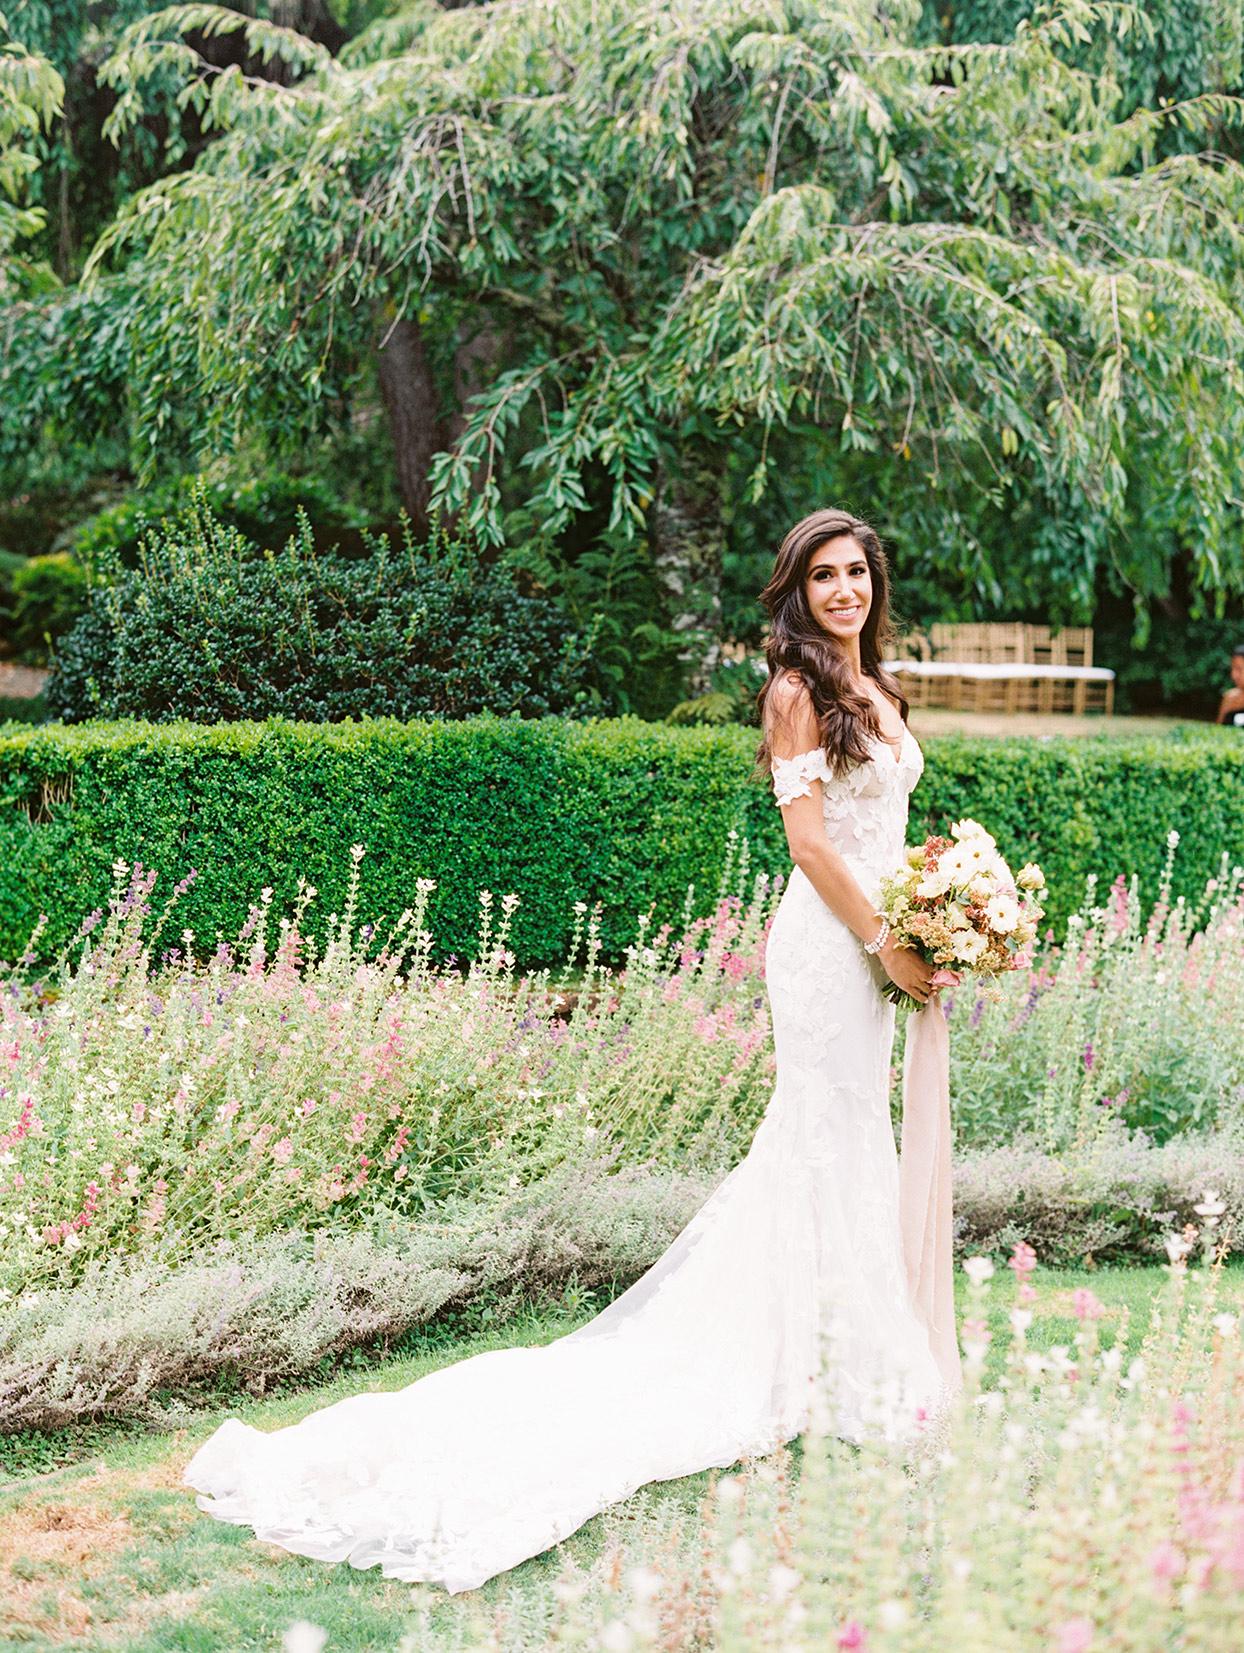 yalda anusha wedding bride standing in garden